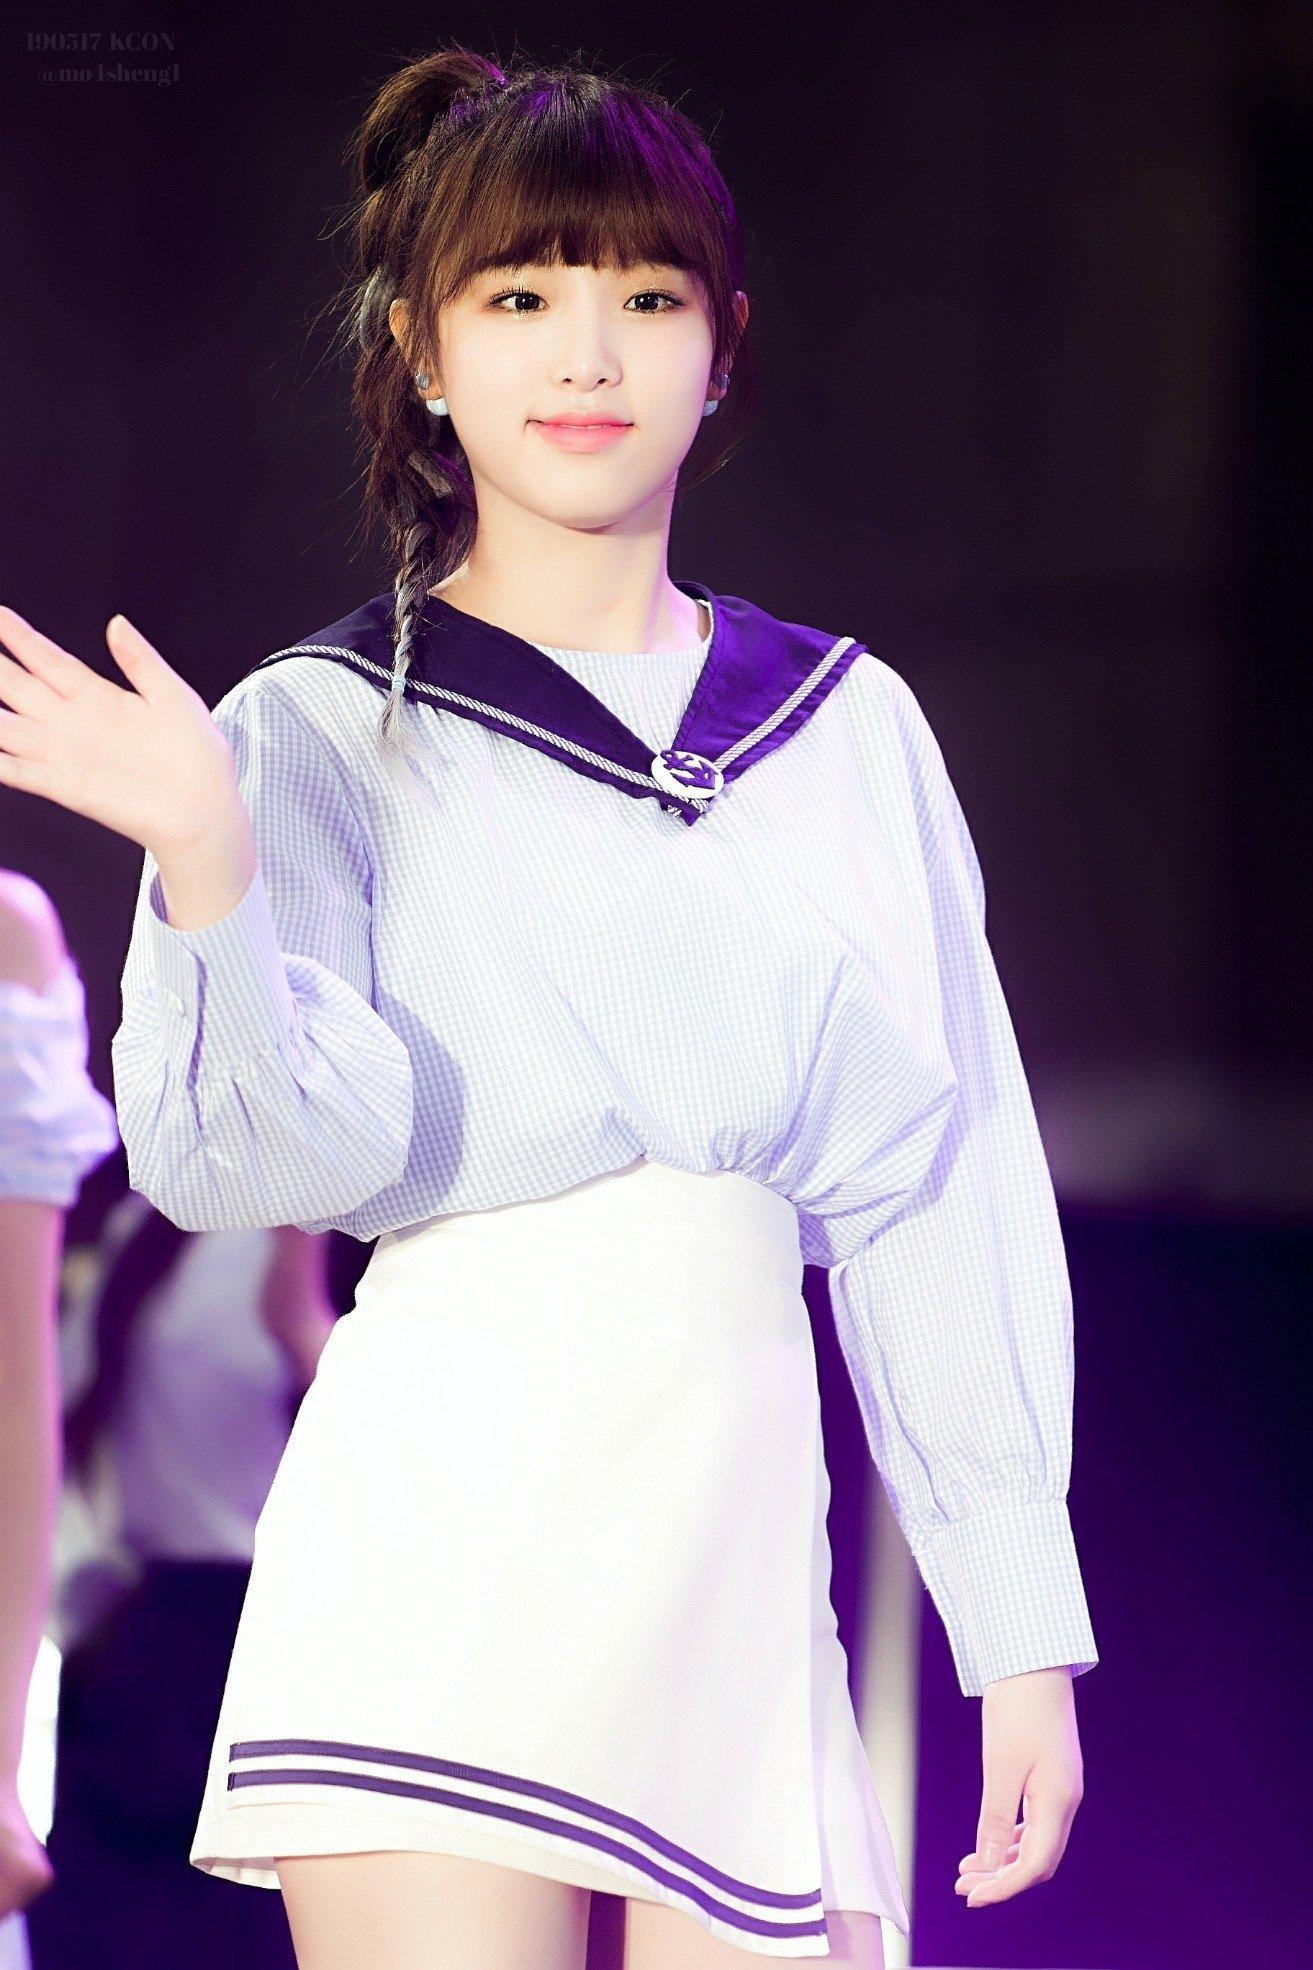 Choi Yena Produce 48 - K-Pop Database / dbkpop.com